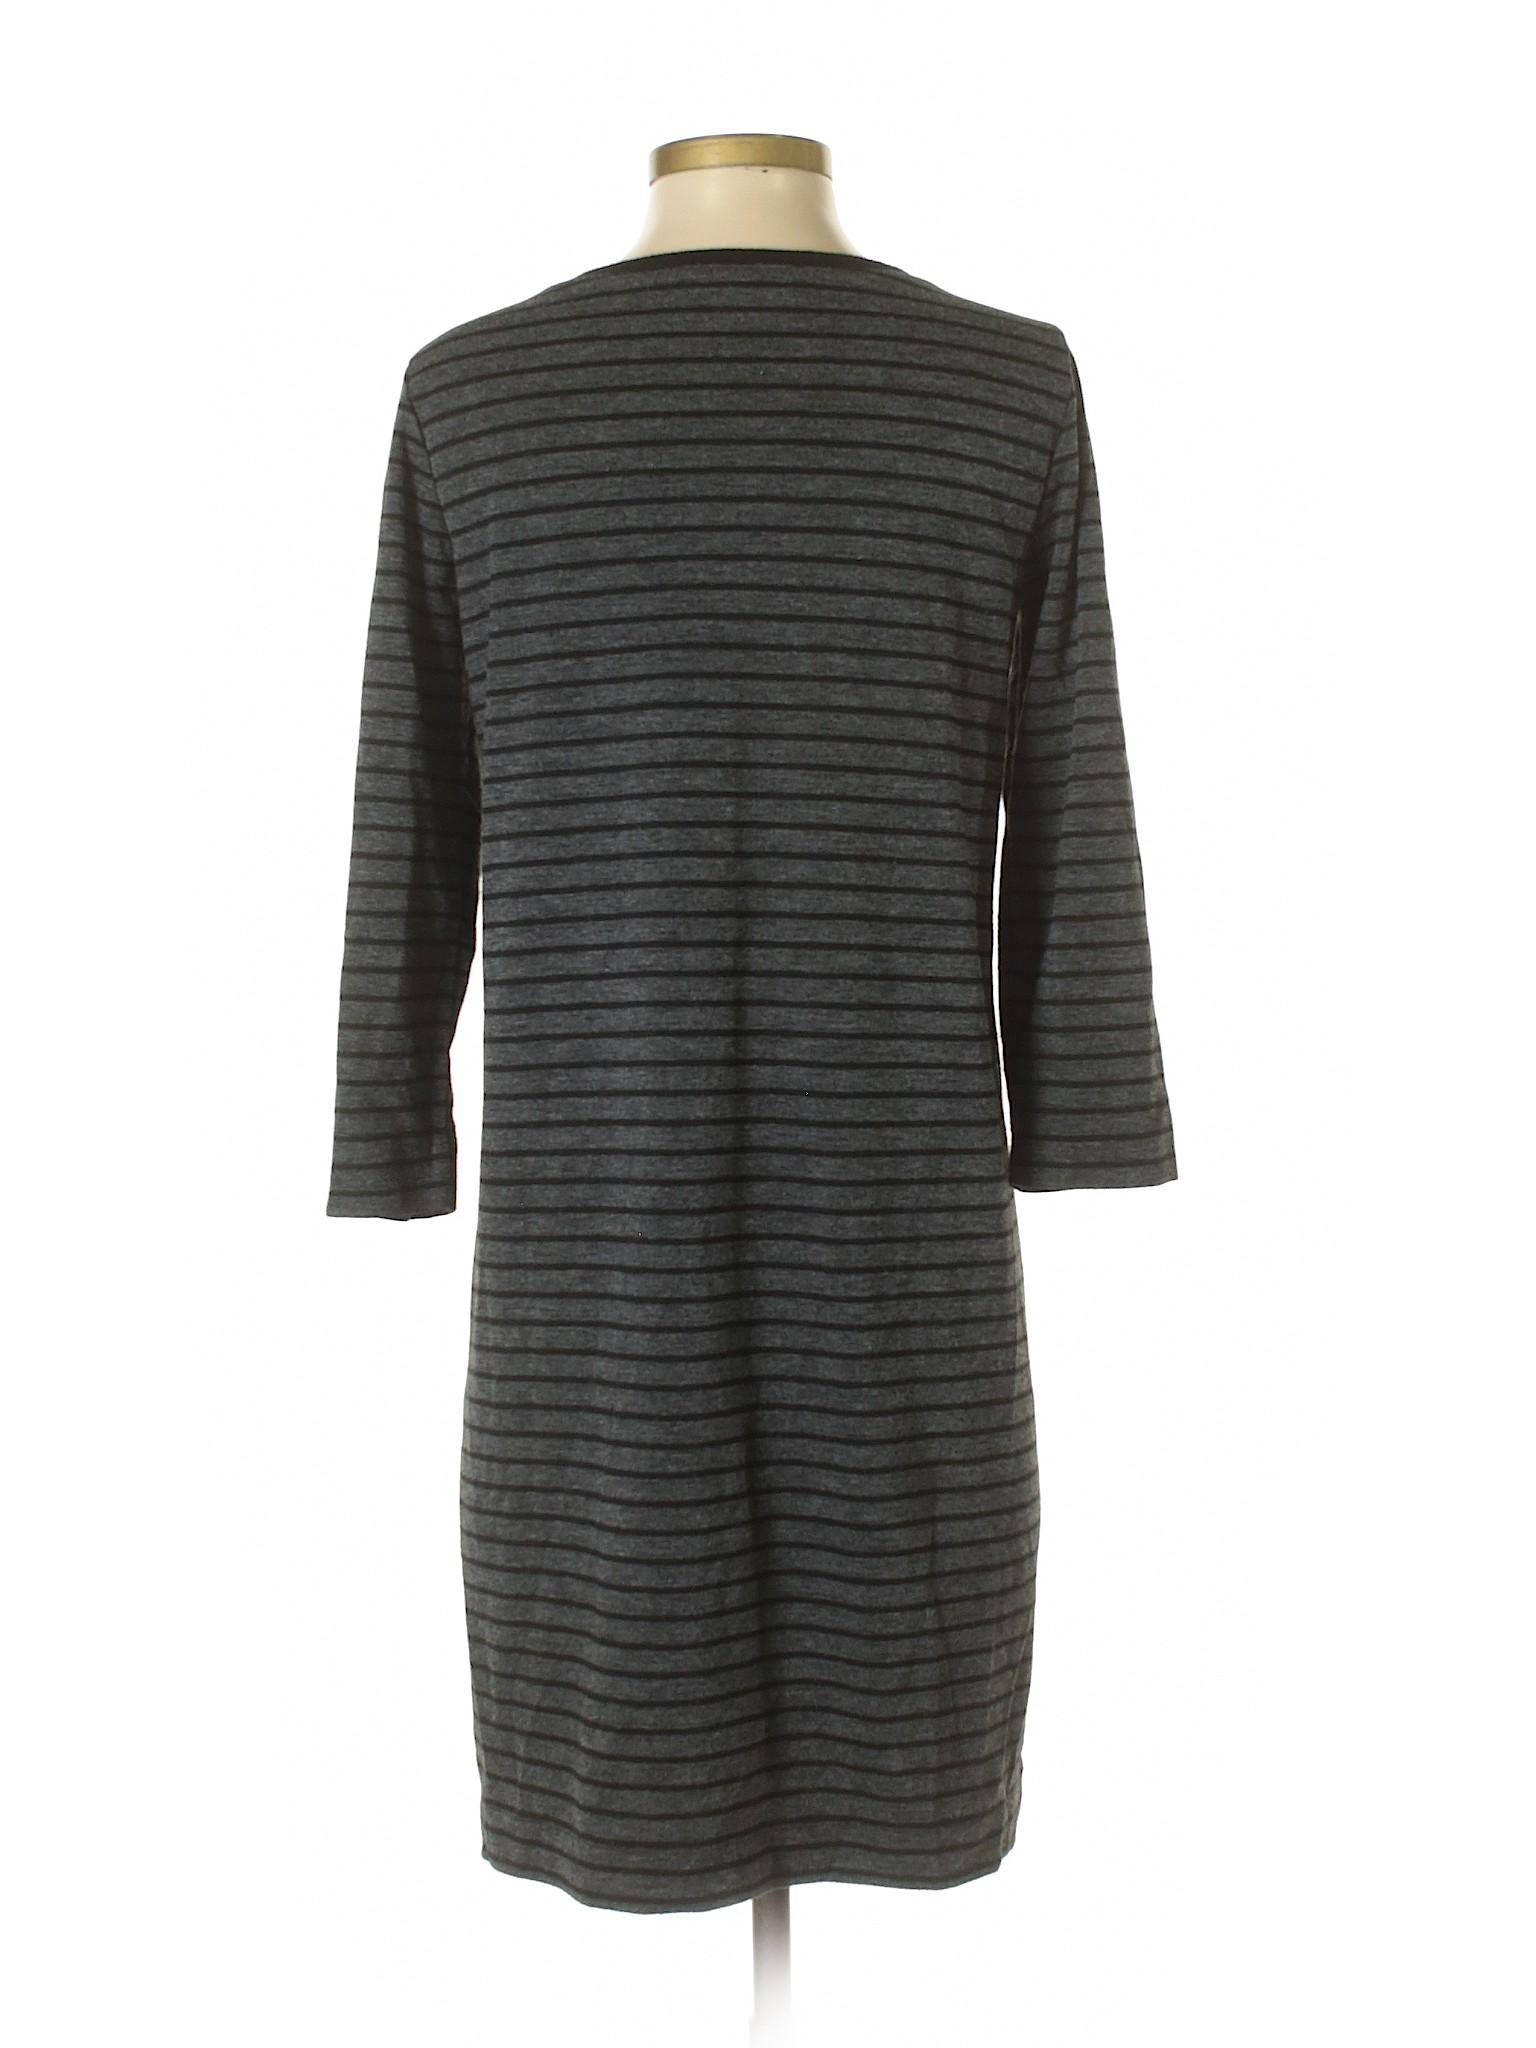 Ann LOFT Dress Boutique Casual Taylor winter Y4xnO65